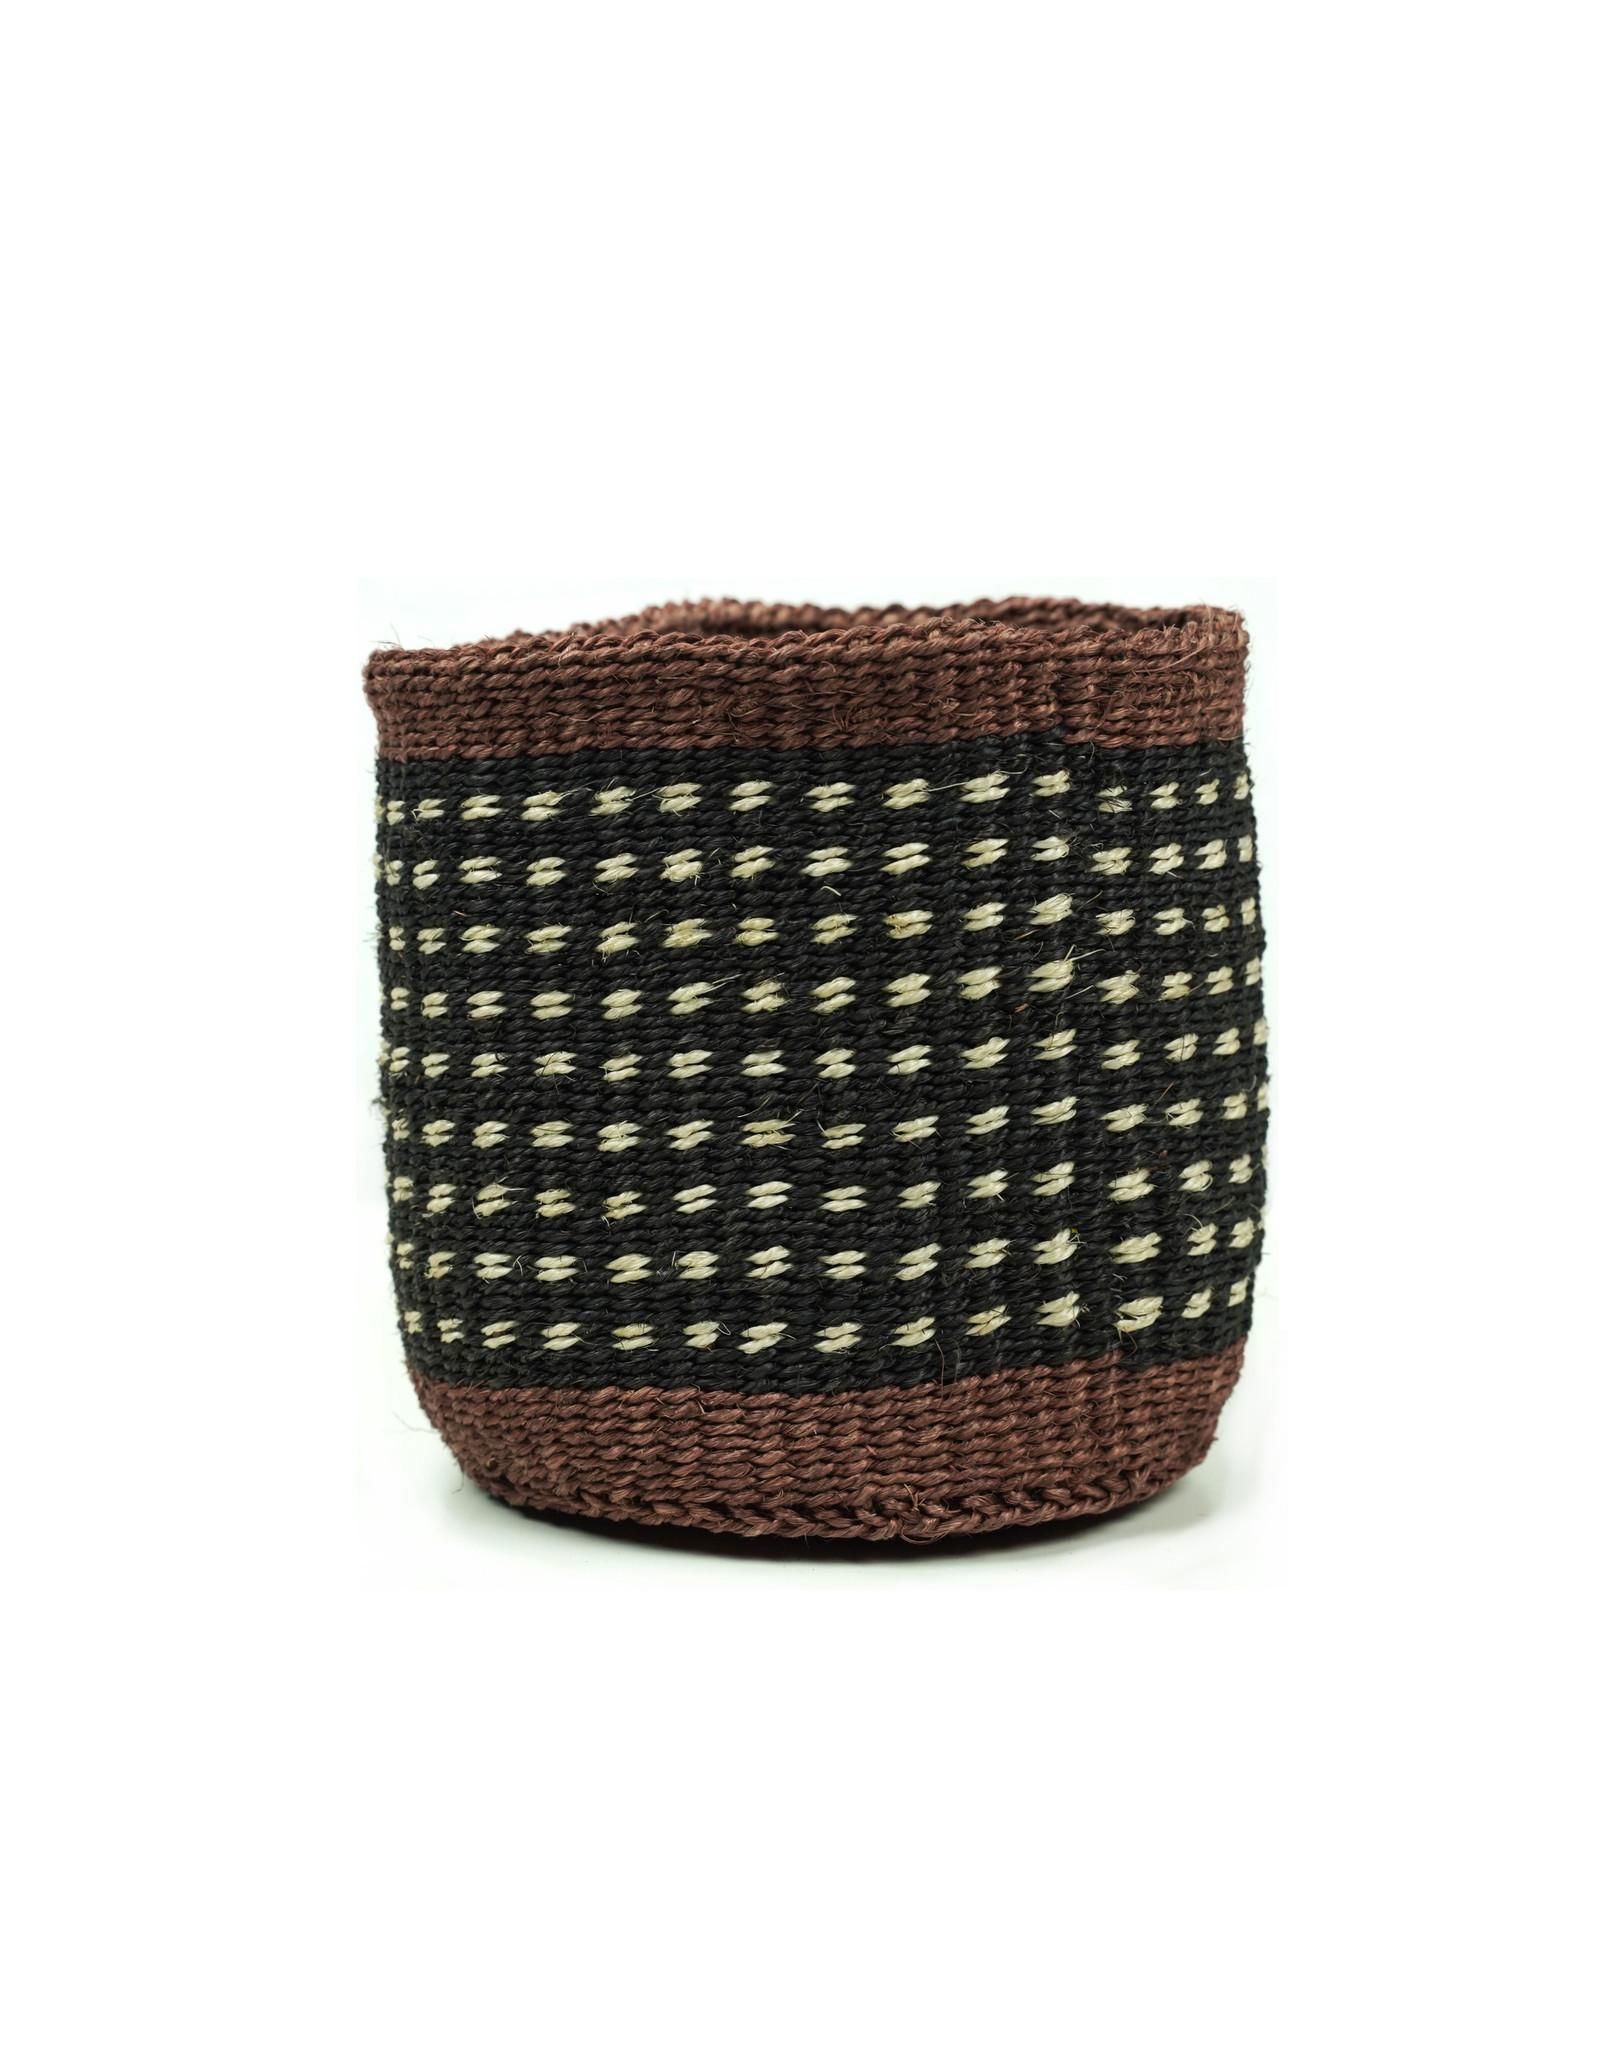 Maisha.Style Taita basket - black brown & ivory - S7